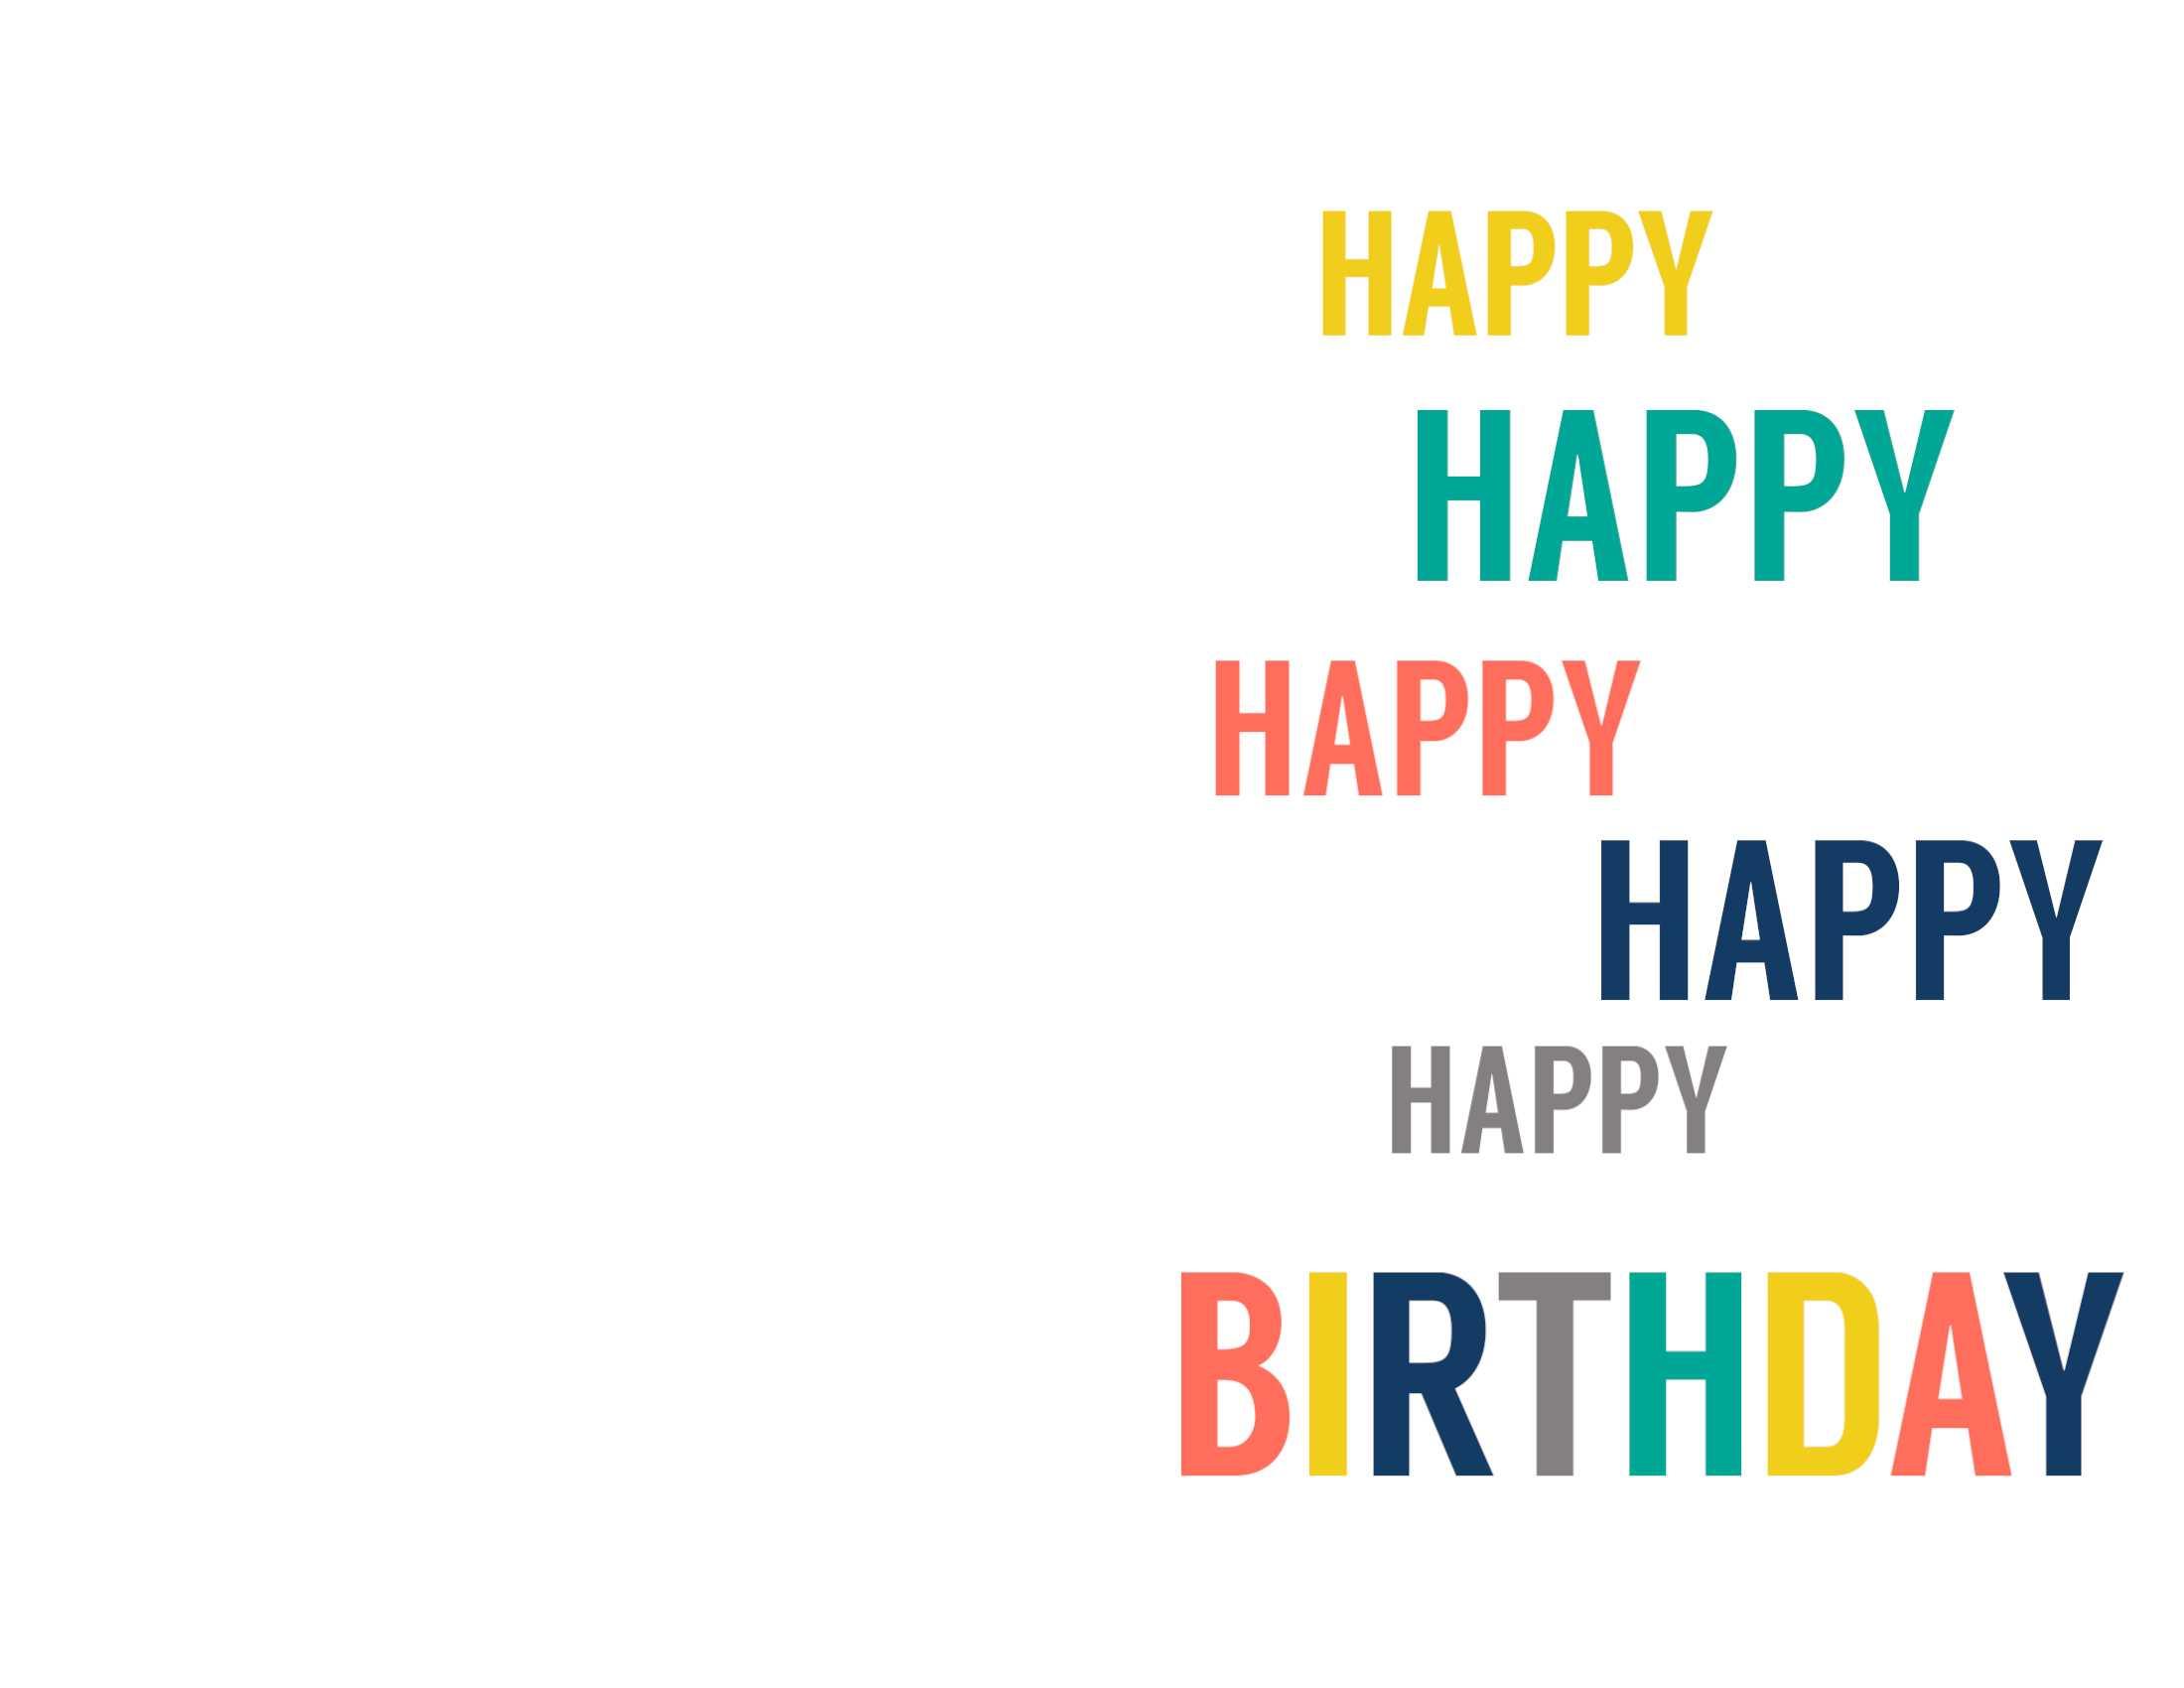 Birthday Cards Templates To Print - Karati.ald2014 With Regard To Foldable Birthday Card Template